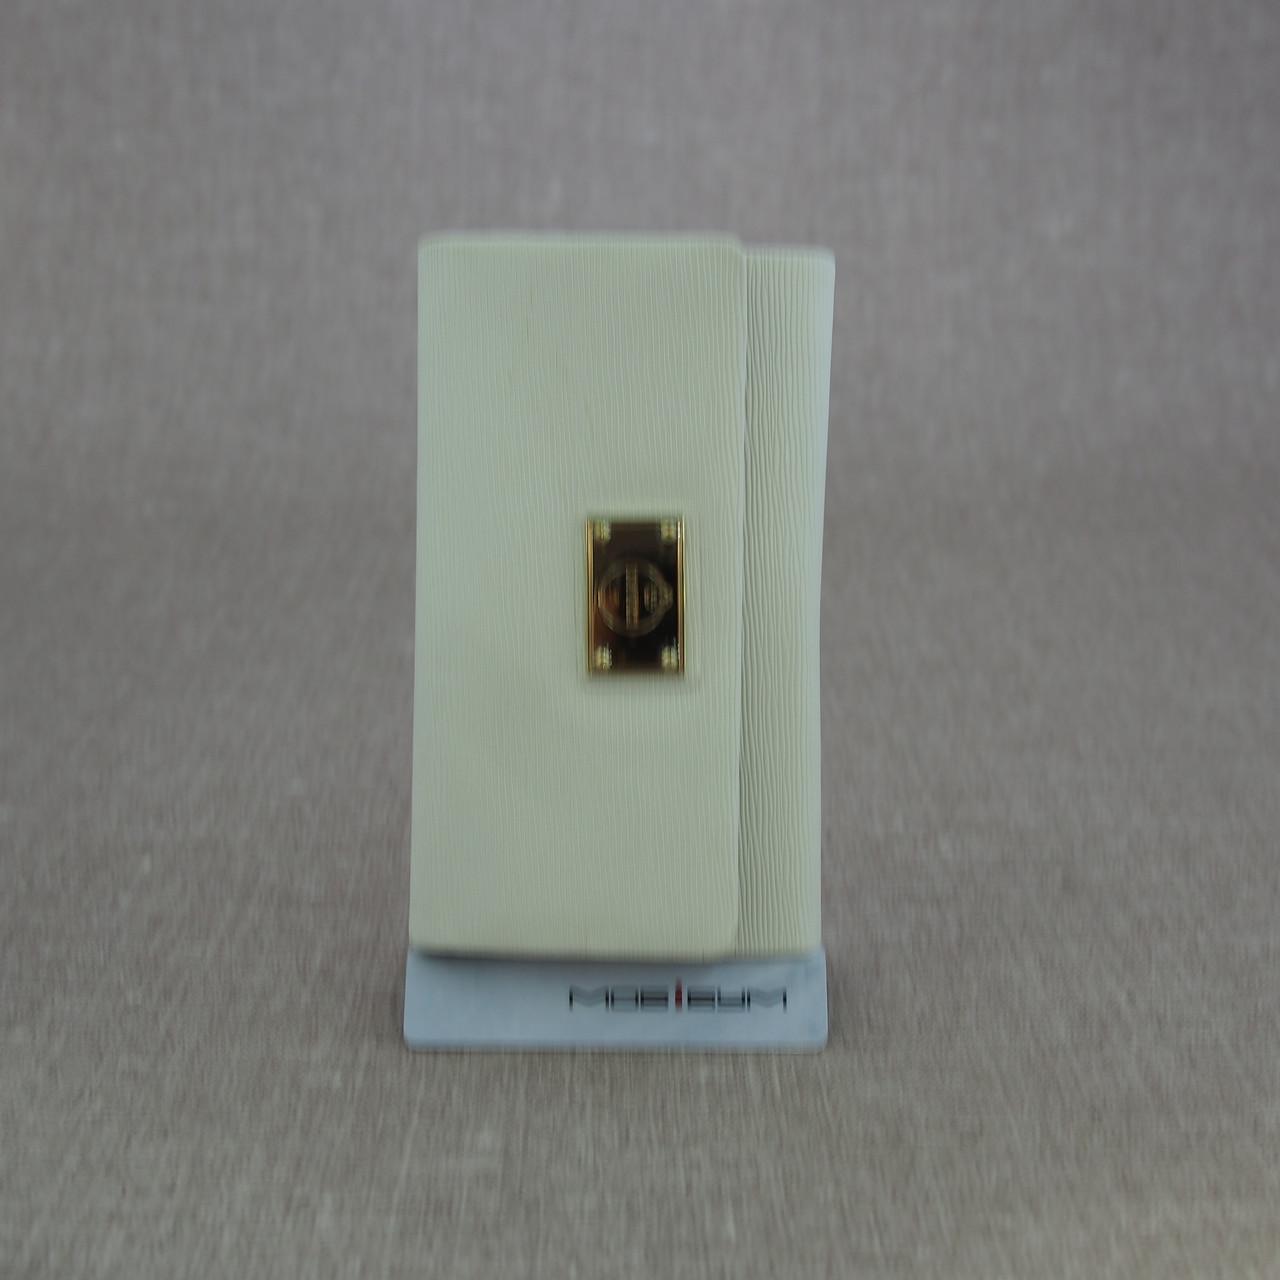 Чехол Ozaki O!Coat Zippy Samsung Galaxy S4 [i9500] white [OC731WH] EAN/UPC: 471897173102